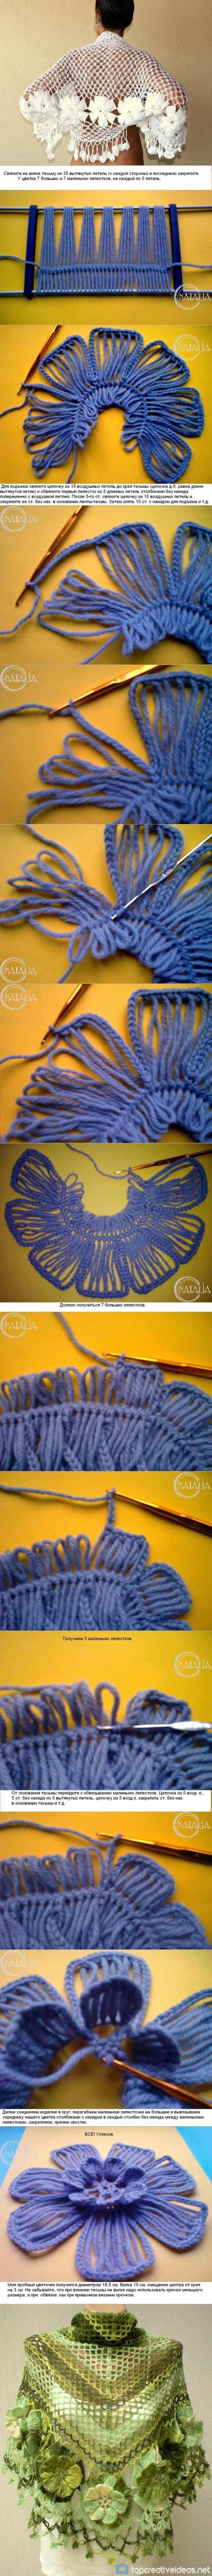 DIY Basic Flower with Crochet Fork and Hook - http://topcreativeideas.net/diy-basic-flower-crochet-fork-hook.html